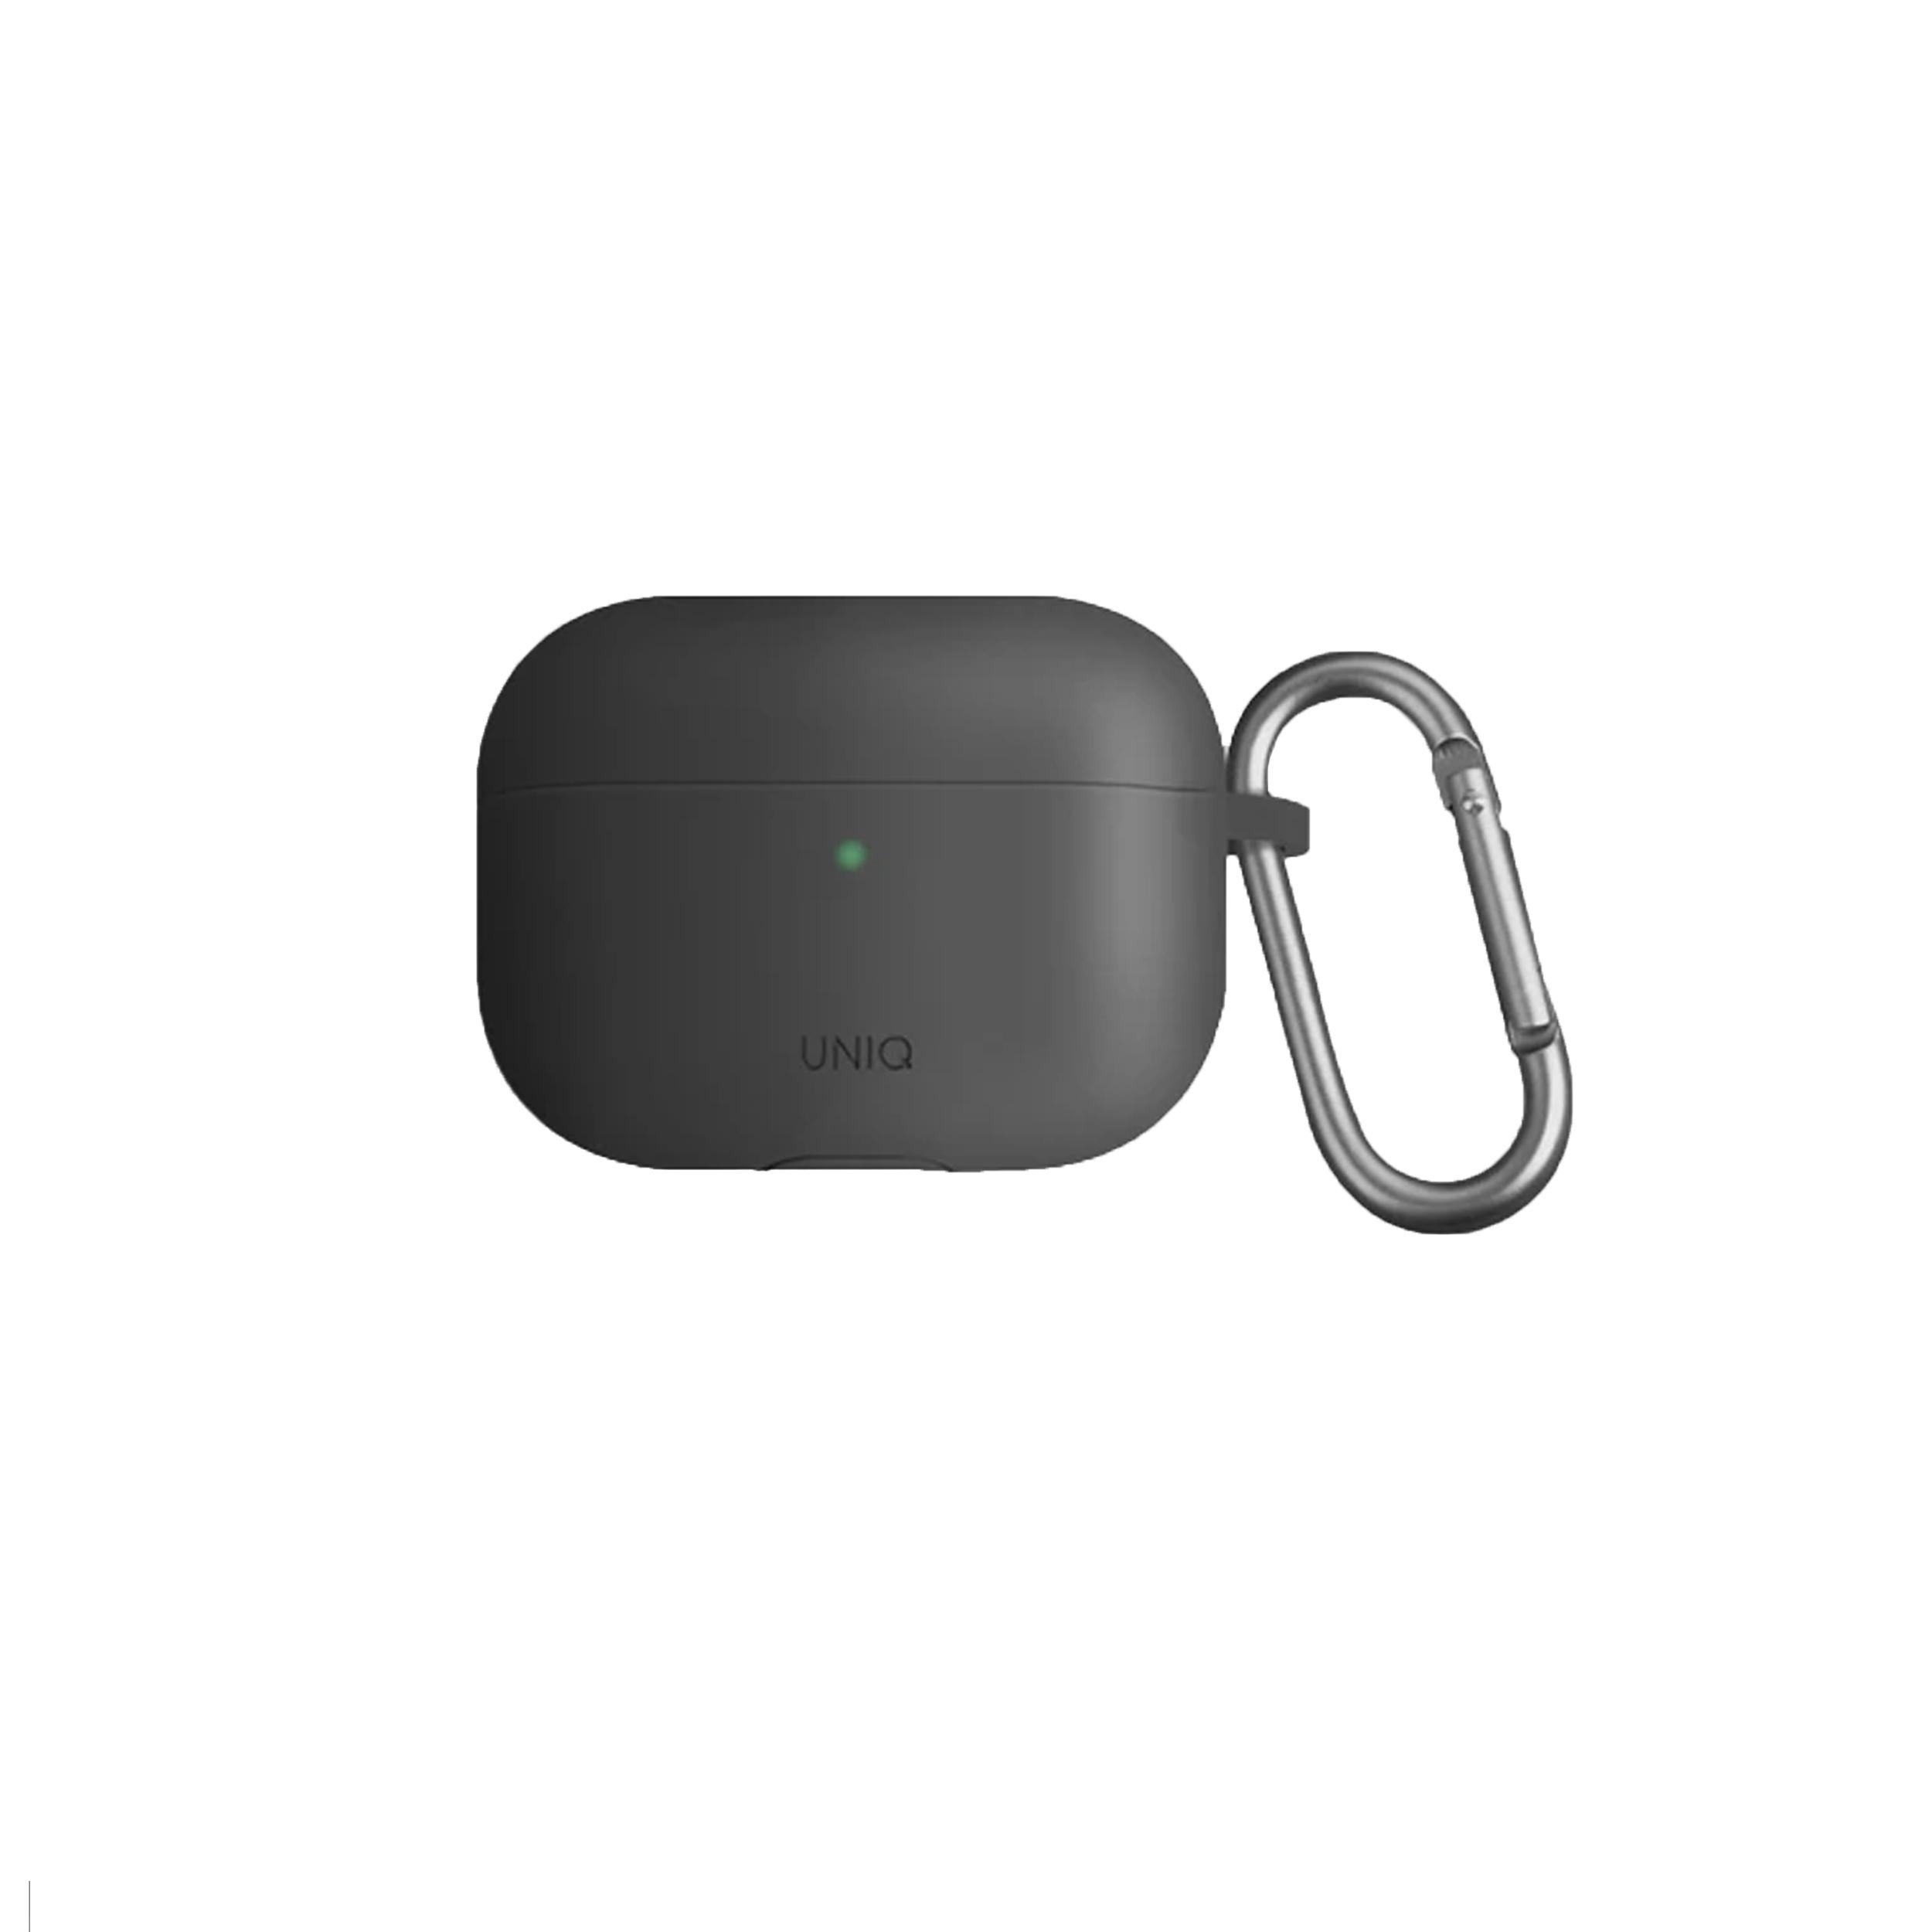 کاور محافظ یونیک مدل Lino مناسب برای کیس هدفون اپل AirPods Pro